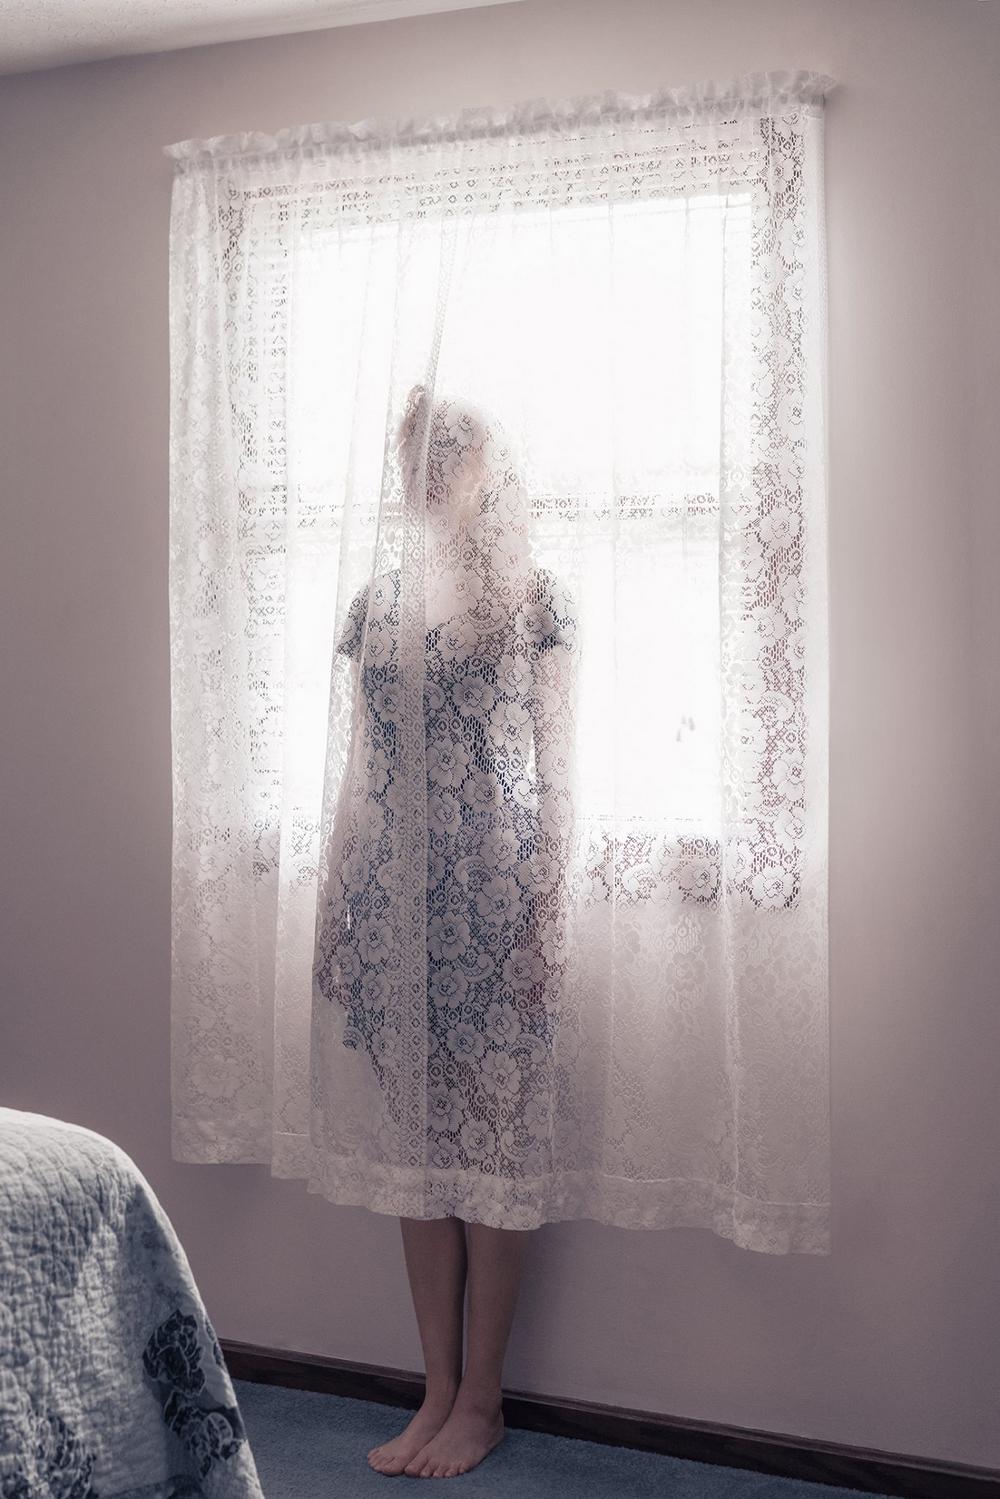 Surrealistic photos of Brooke Didonato 23